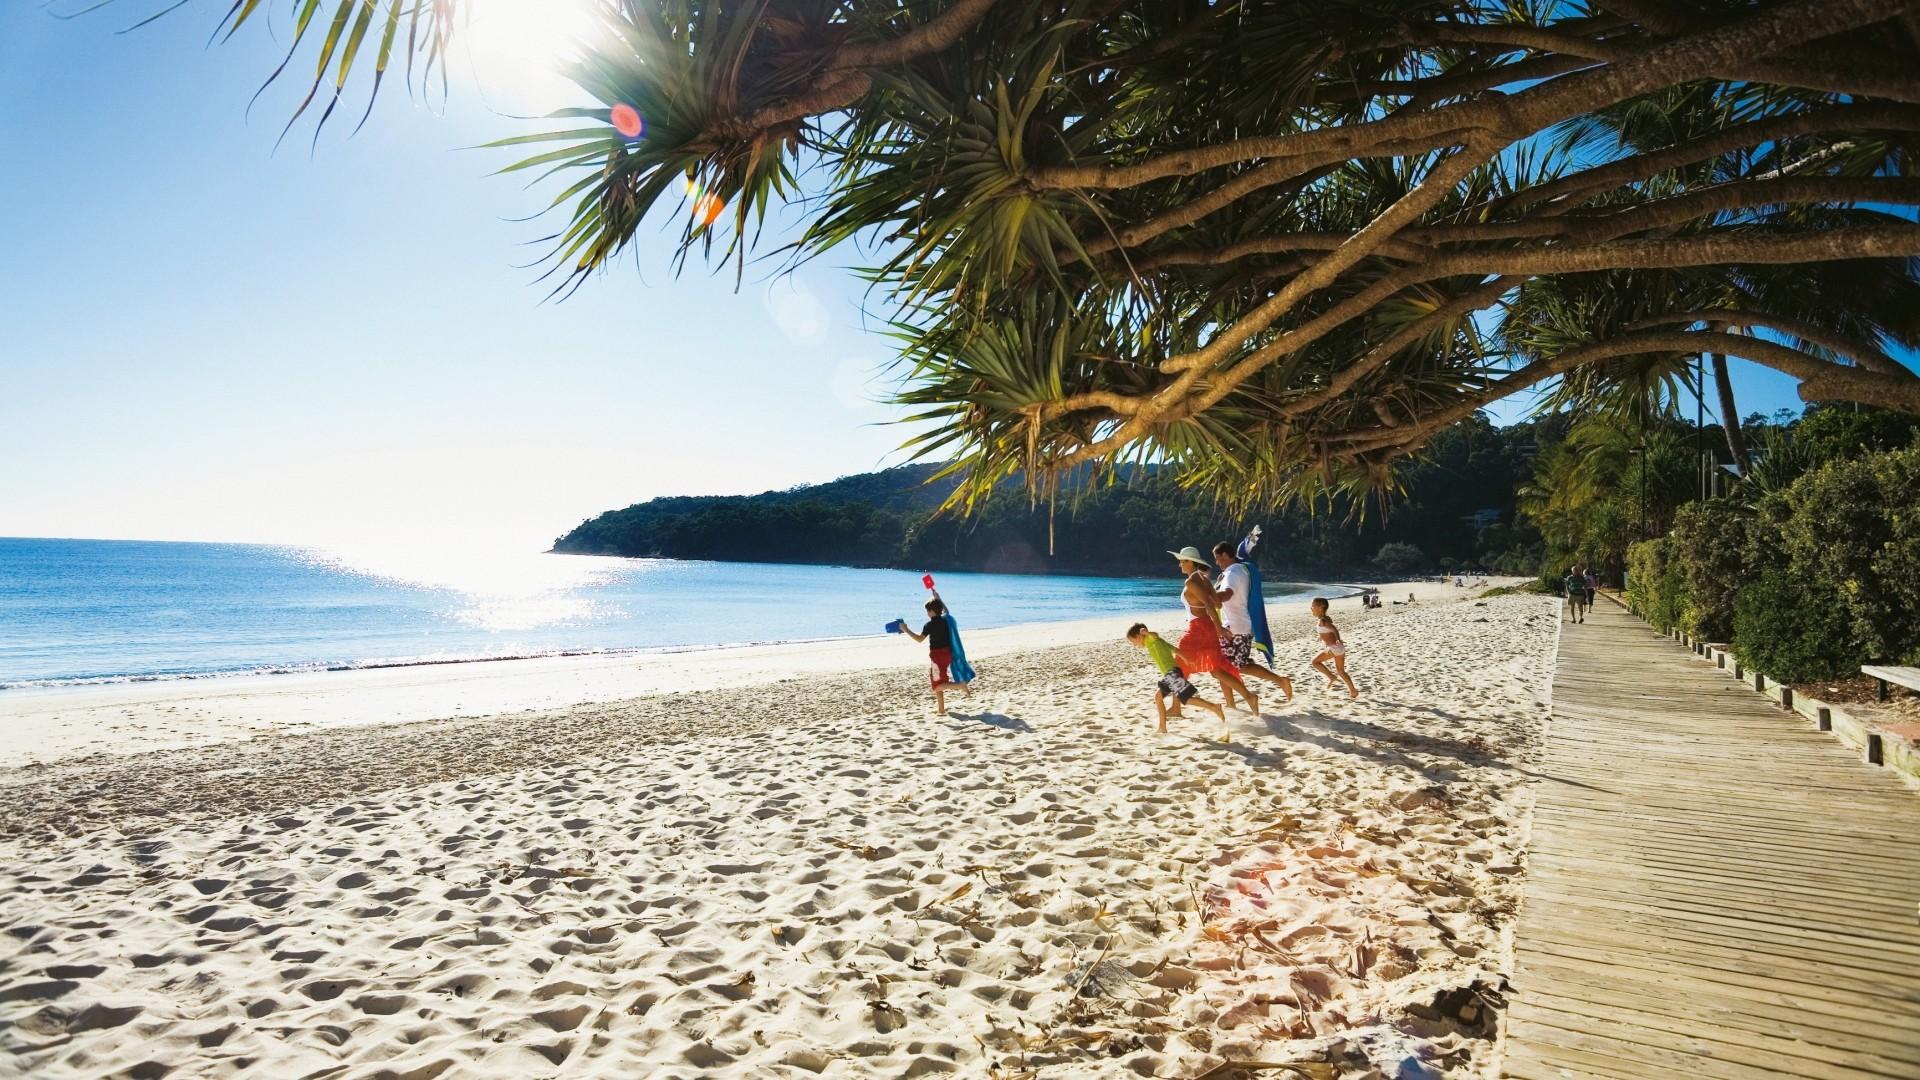 Wallpaper beach, tropics, sea, sand, people